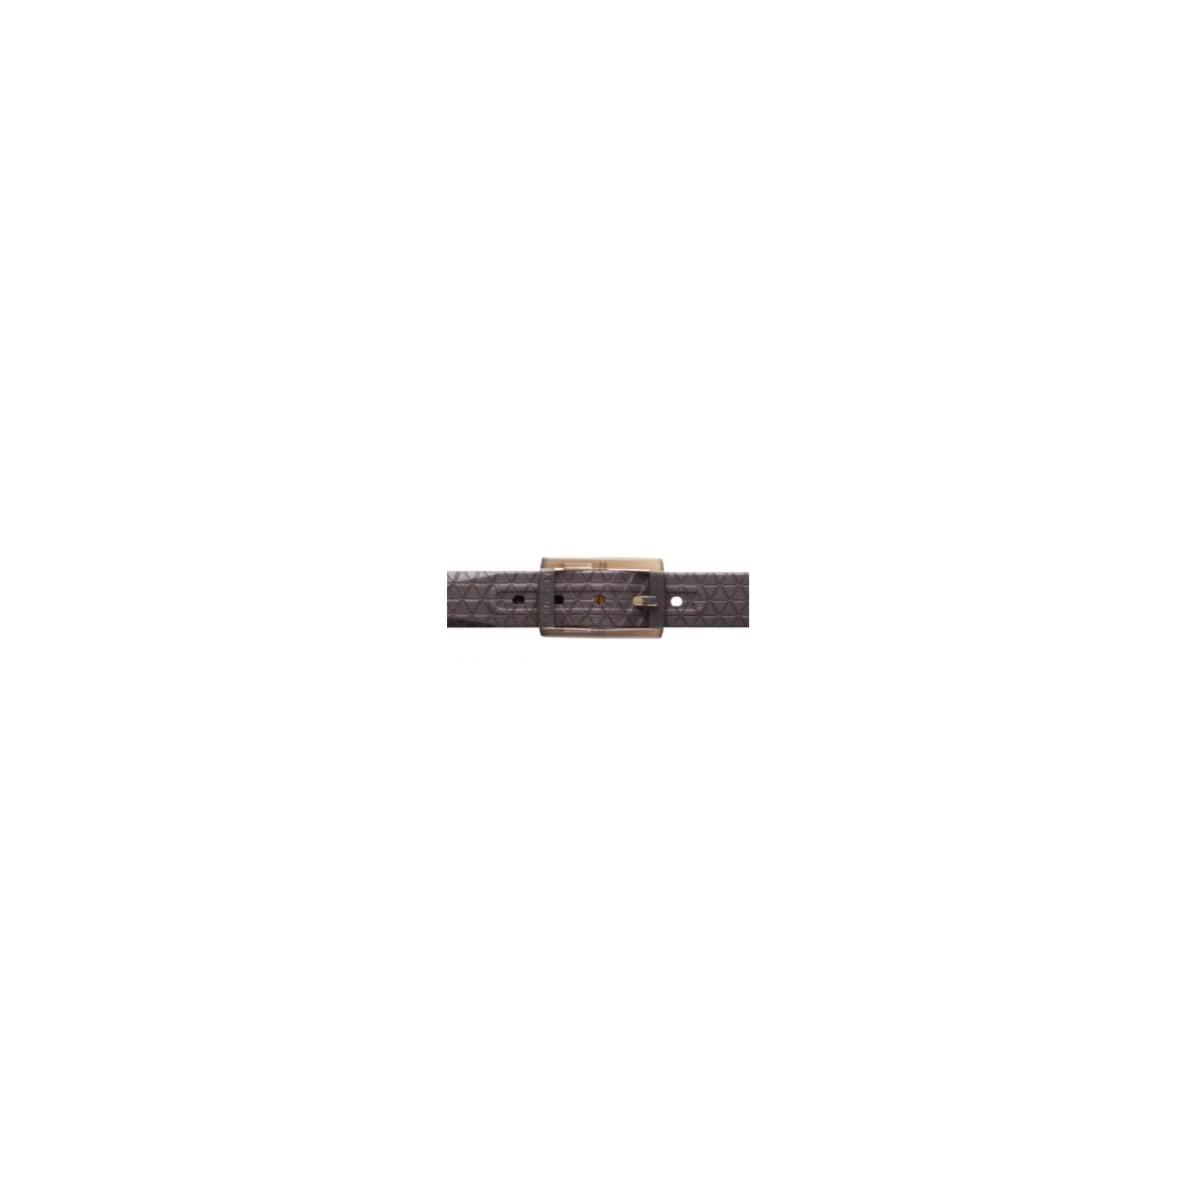 Cintura Tie-ups - Cintura basic vintage